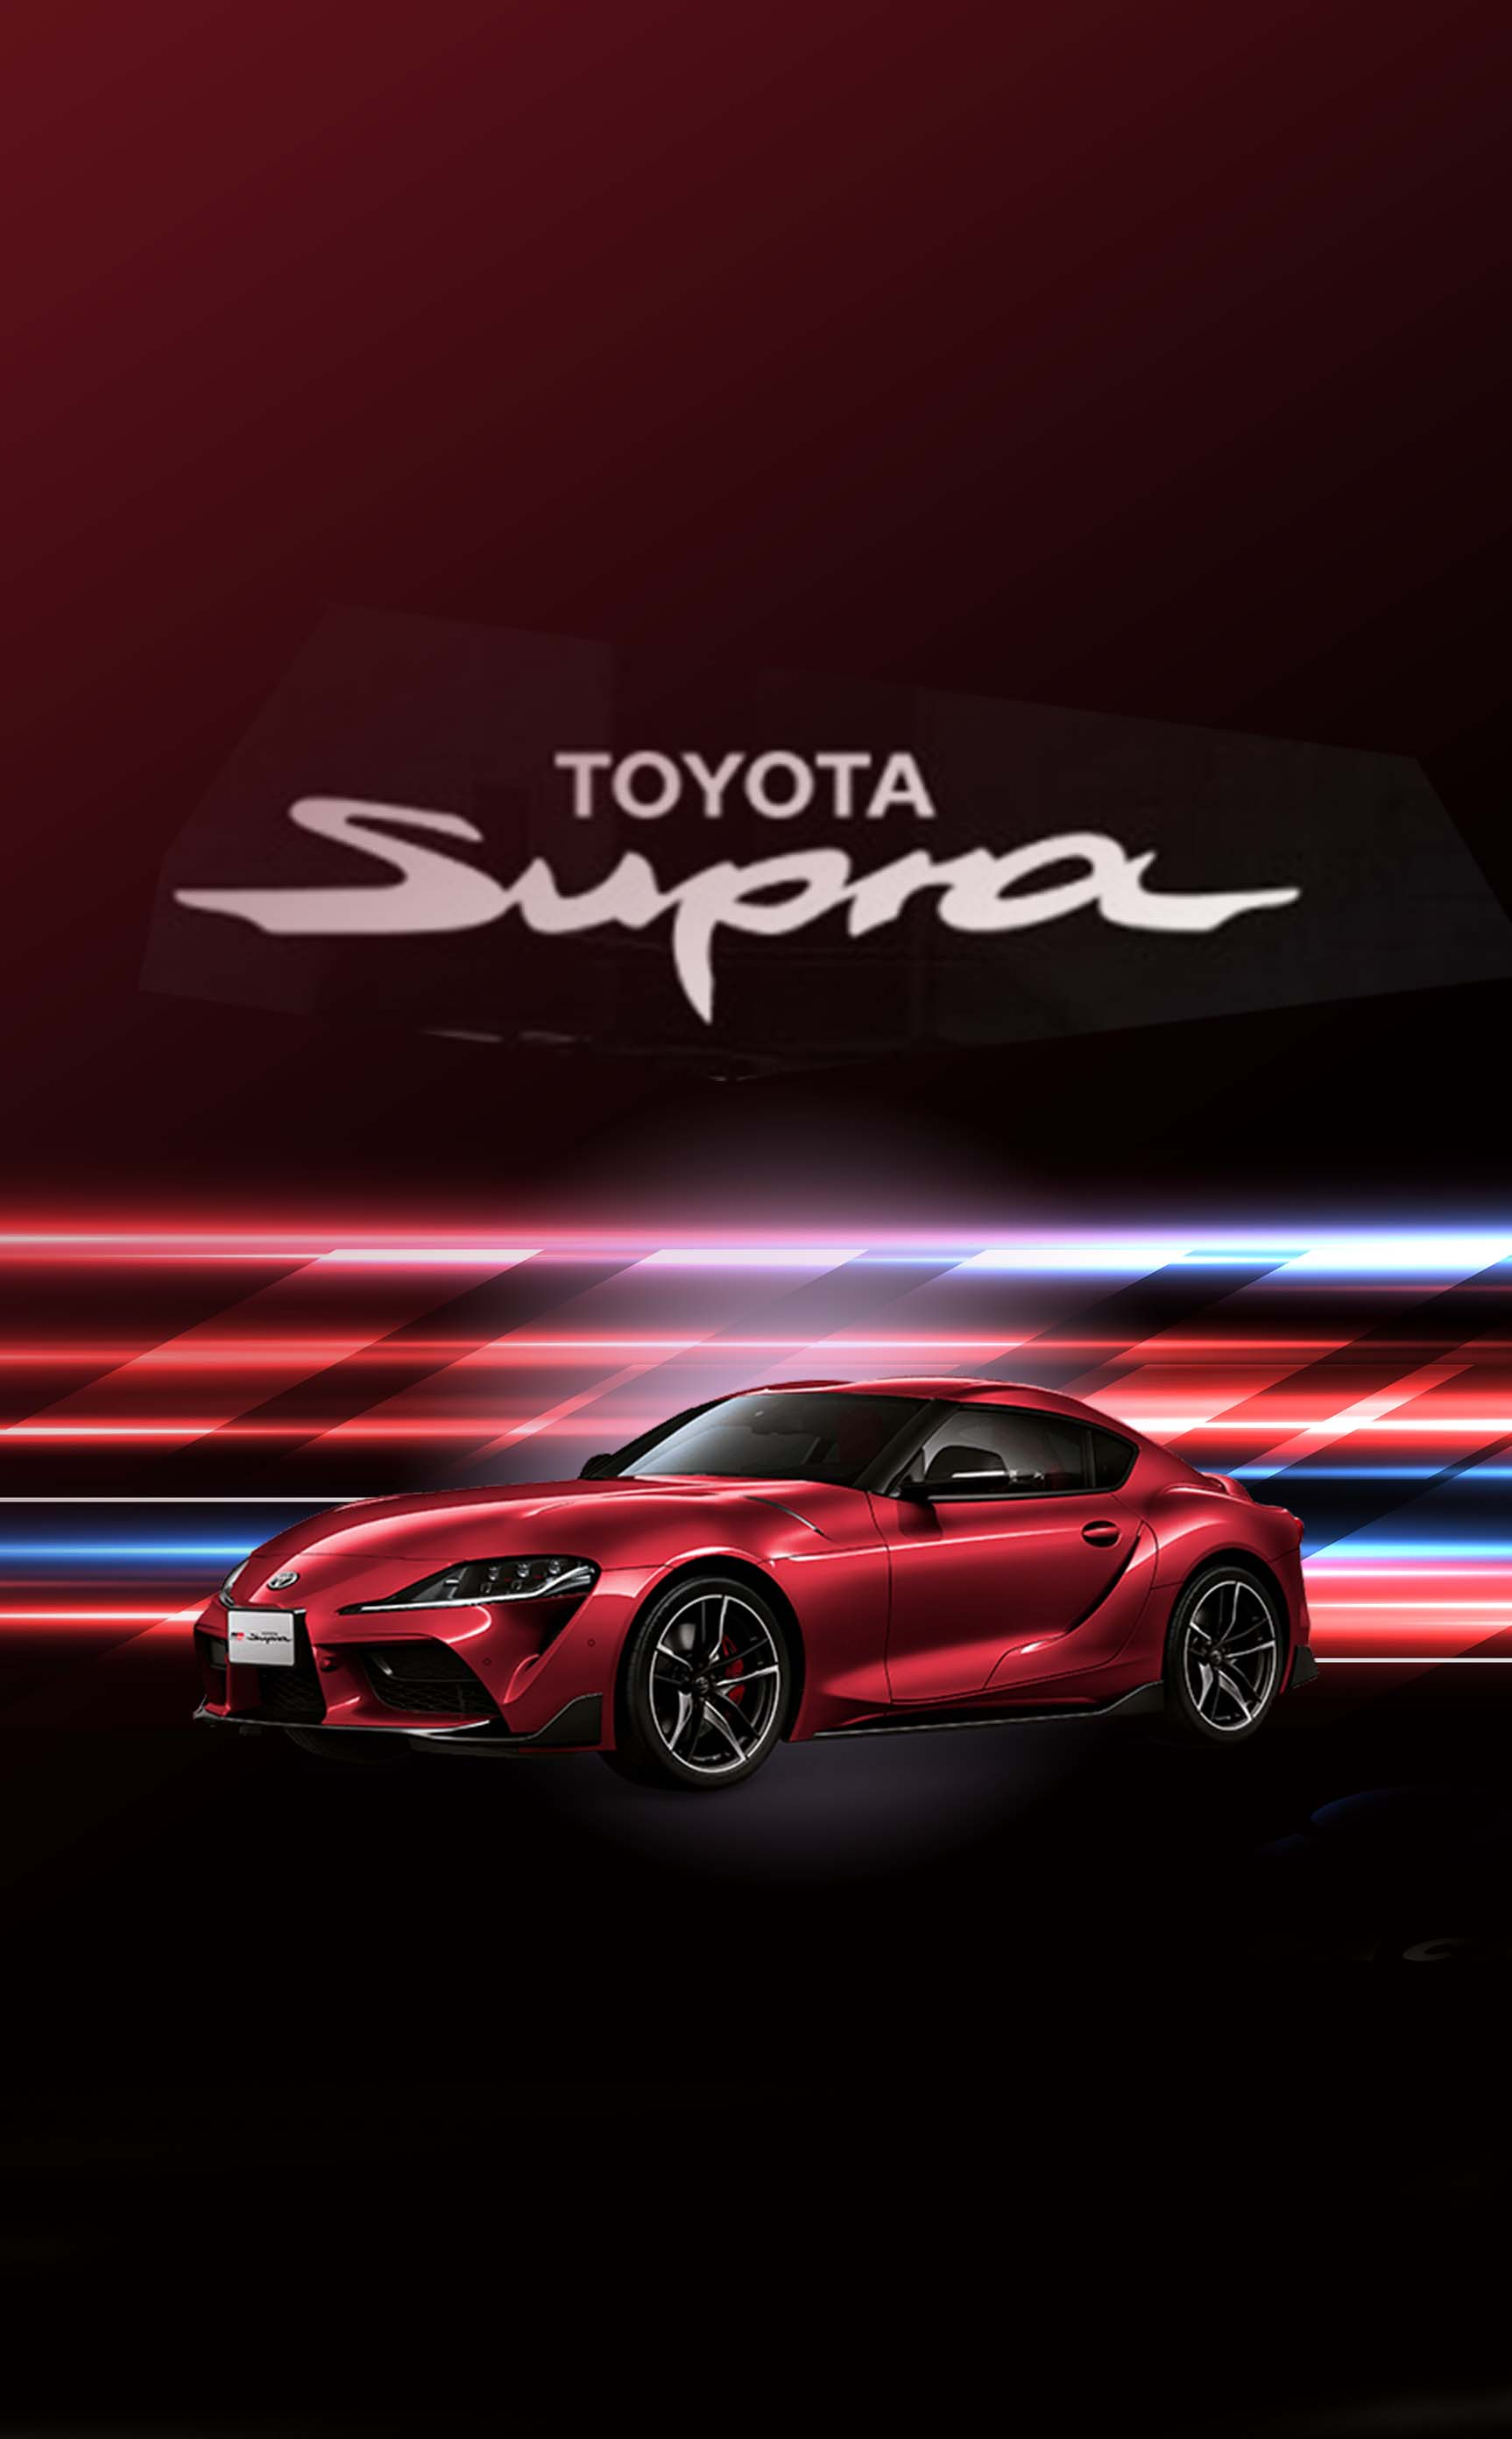 Toyota Supra.jpg